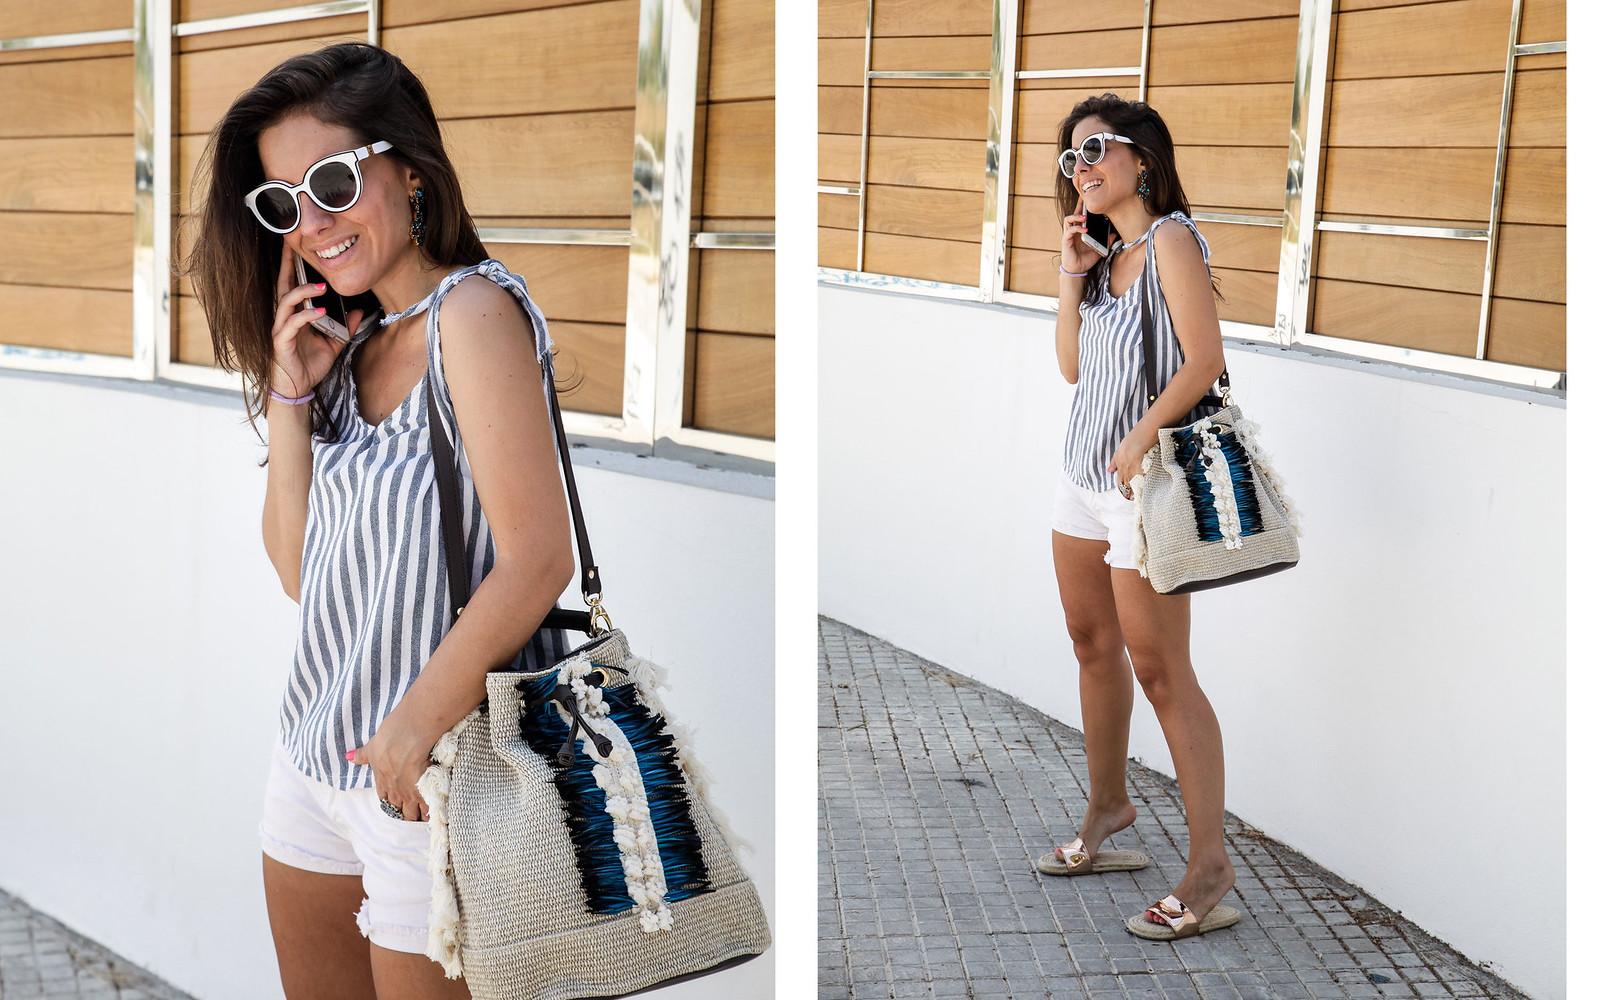 04_como_combinar_un_top_de_rayas_nuevo_bolso_boho_theguestgirl_influencer_spain_barcelona_viamailbag_boho_fringed_bag